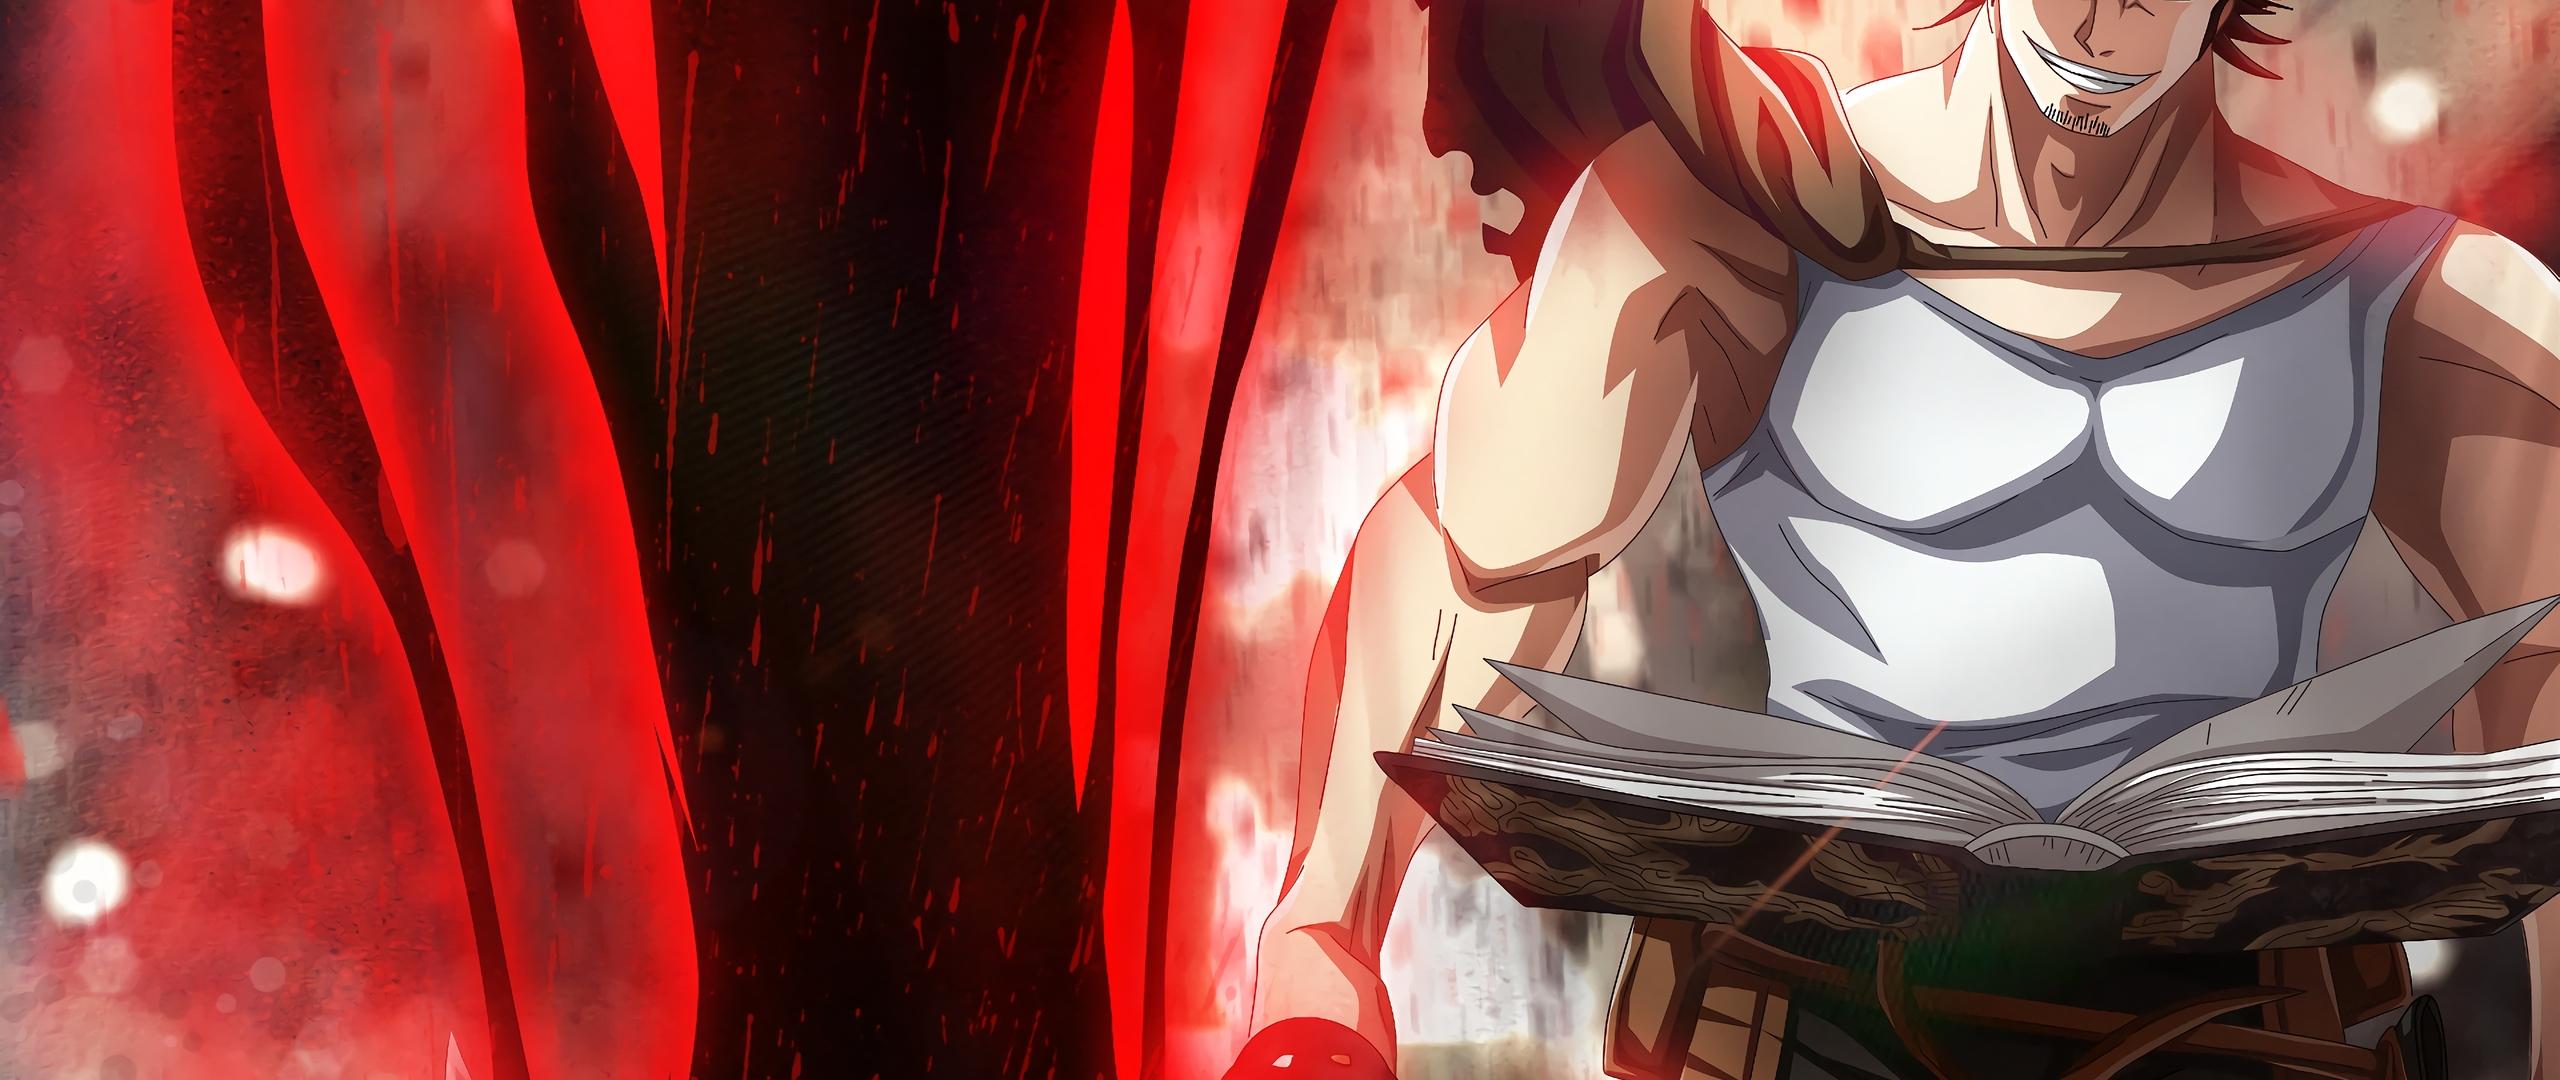 2560x1080 4k Black Clover Anime 2560x1080 Resolution HD 4k ...